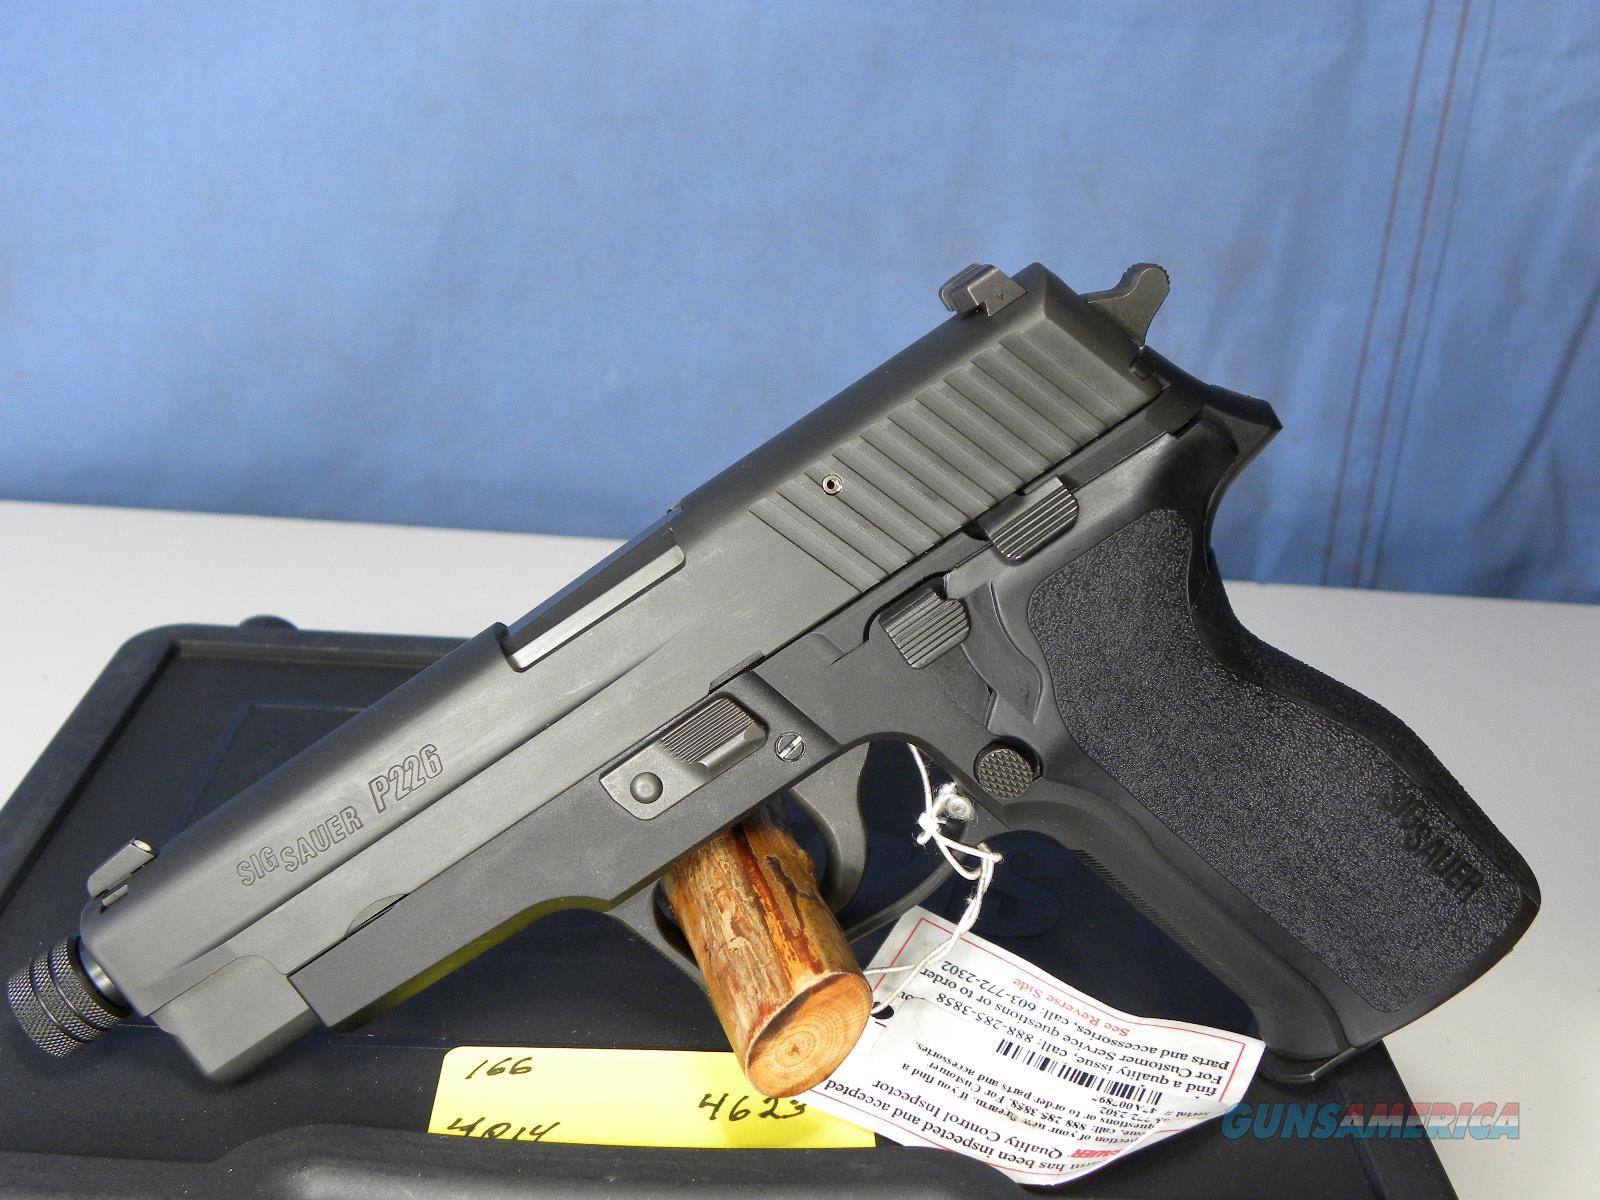 Sig Sauer 226-9-BSS Threaded Barrel  Guns > Pistols > Sig - Sauer/Sigarms Pistols > P226